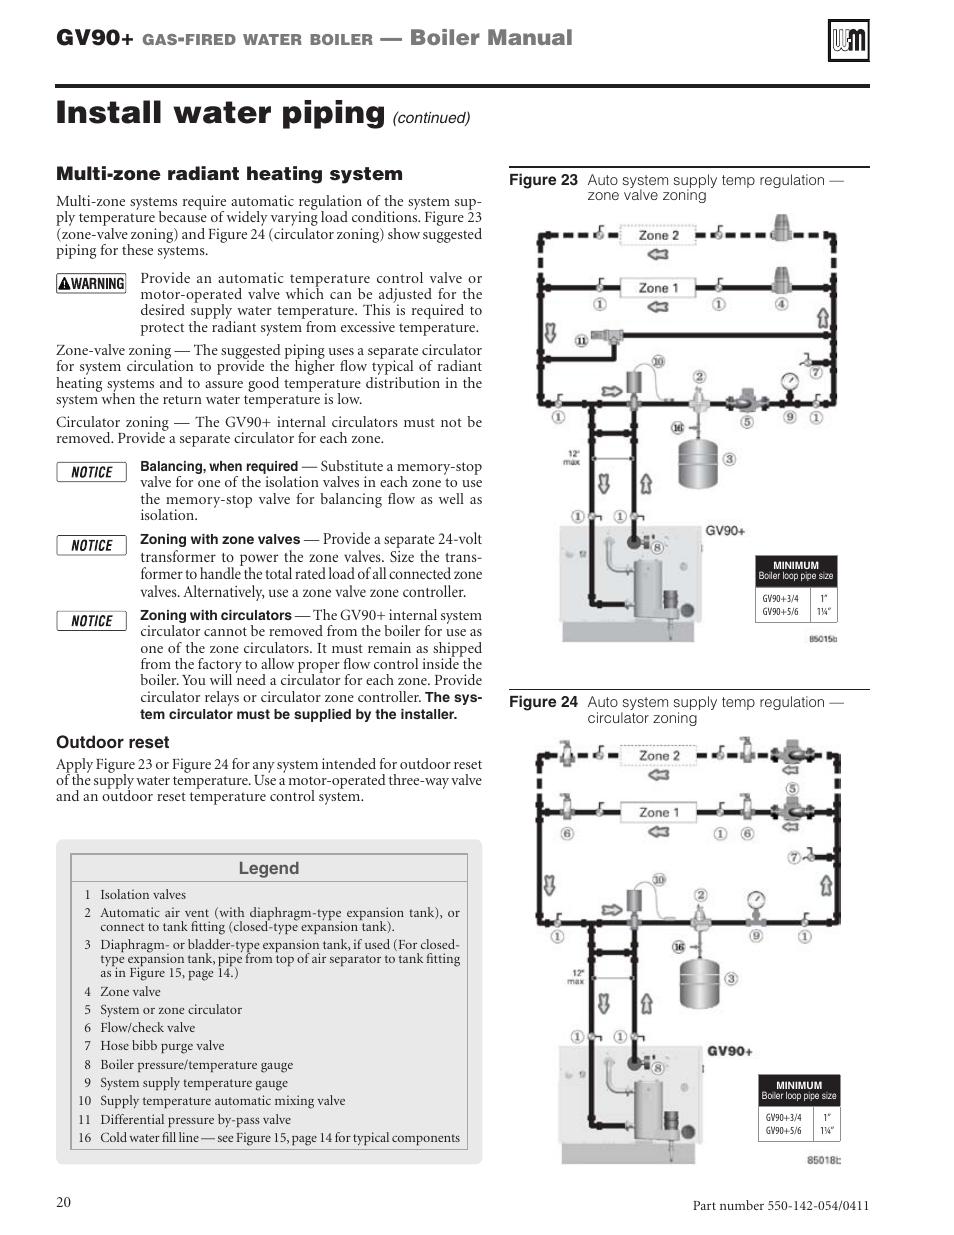 Install water piping, Gv90, Boiler manual | Weil-McLain GV90+ User Manual |